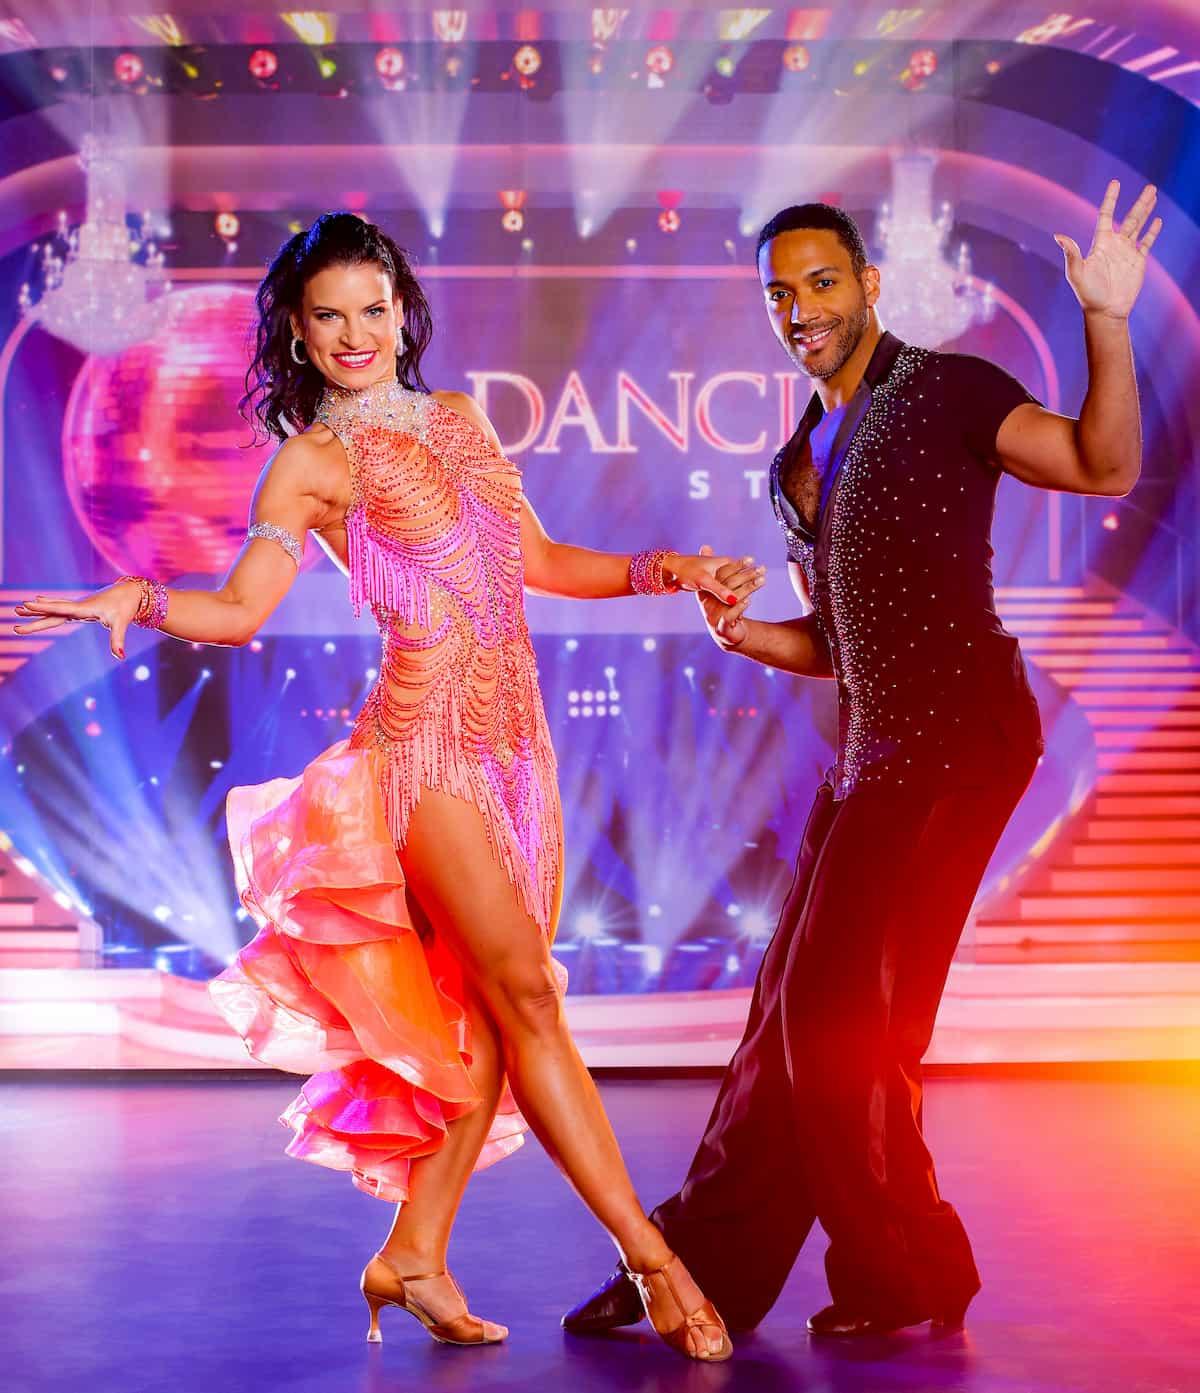 Dancing Stars am 13.11.2020 Conny Kreuter und Cesar Sampson